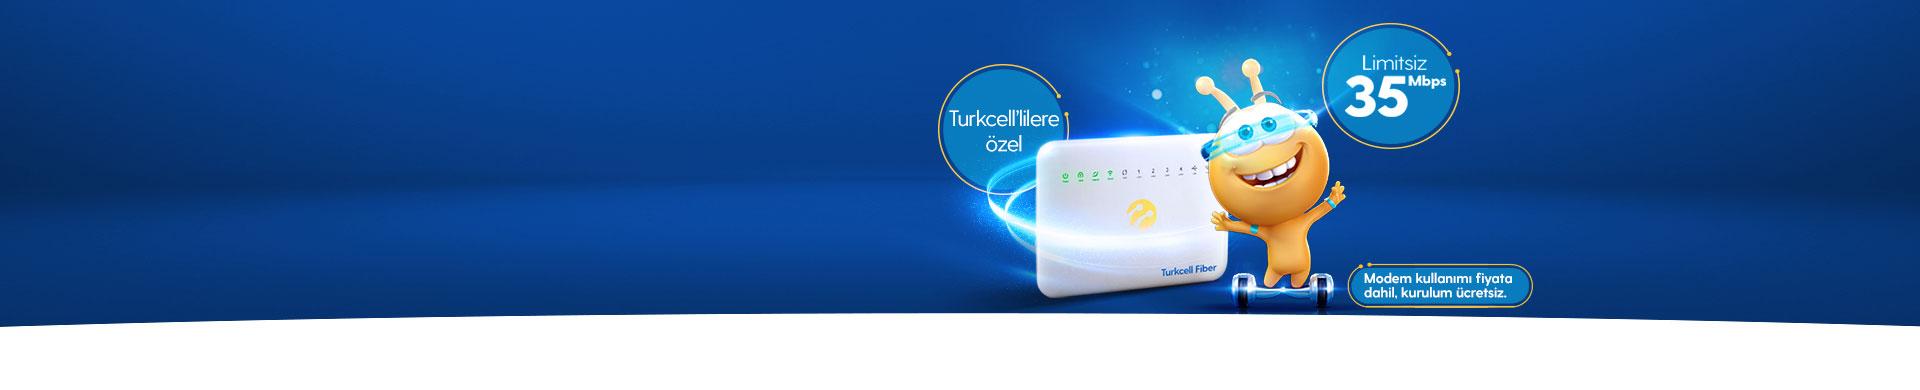 Turkcell Fiber İlk 3 Ay Ücretsiz